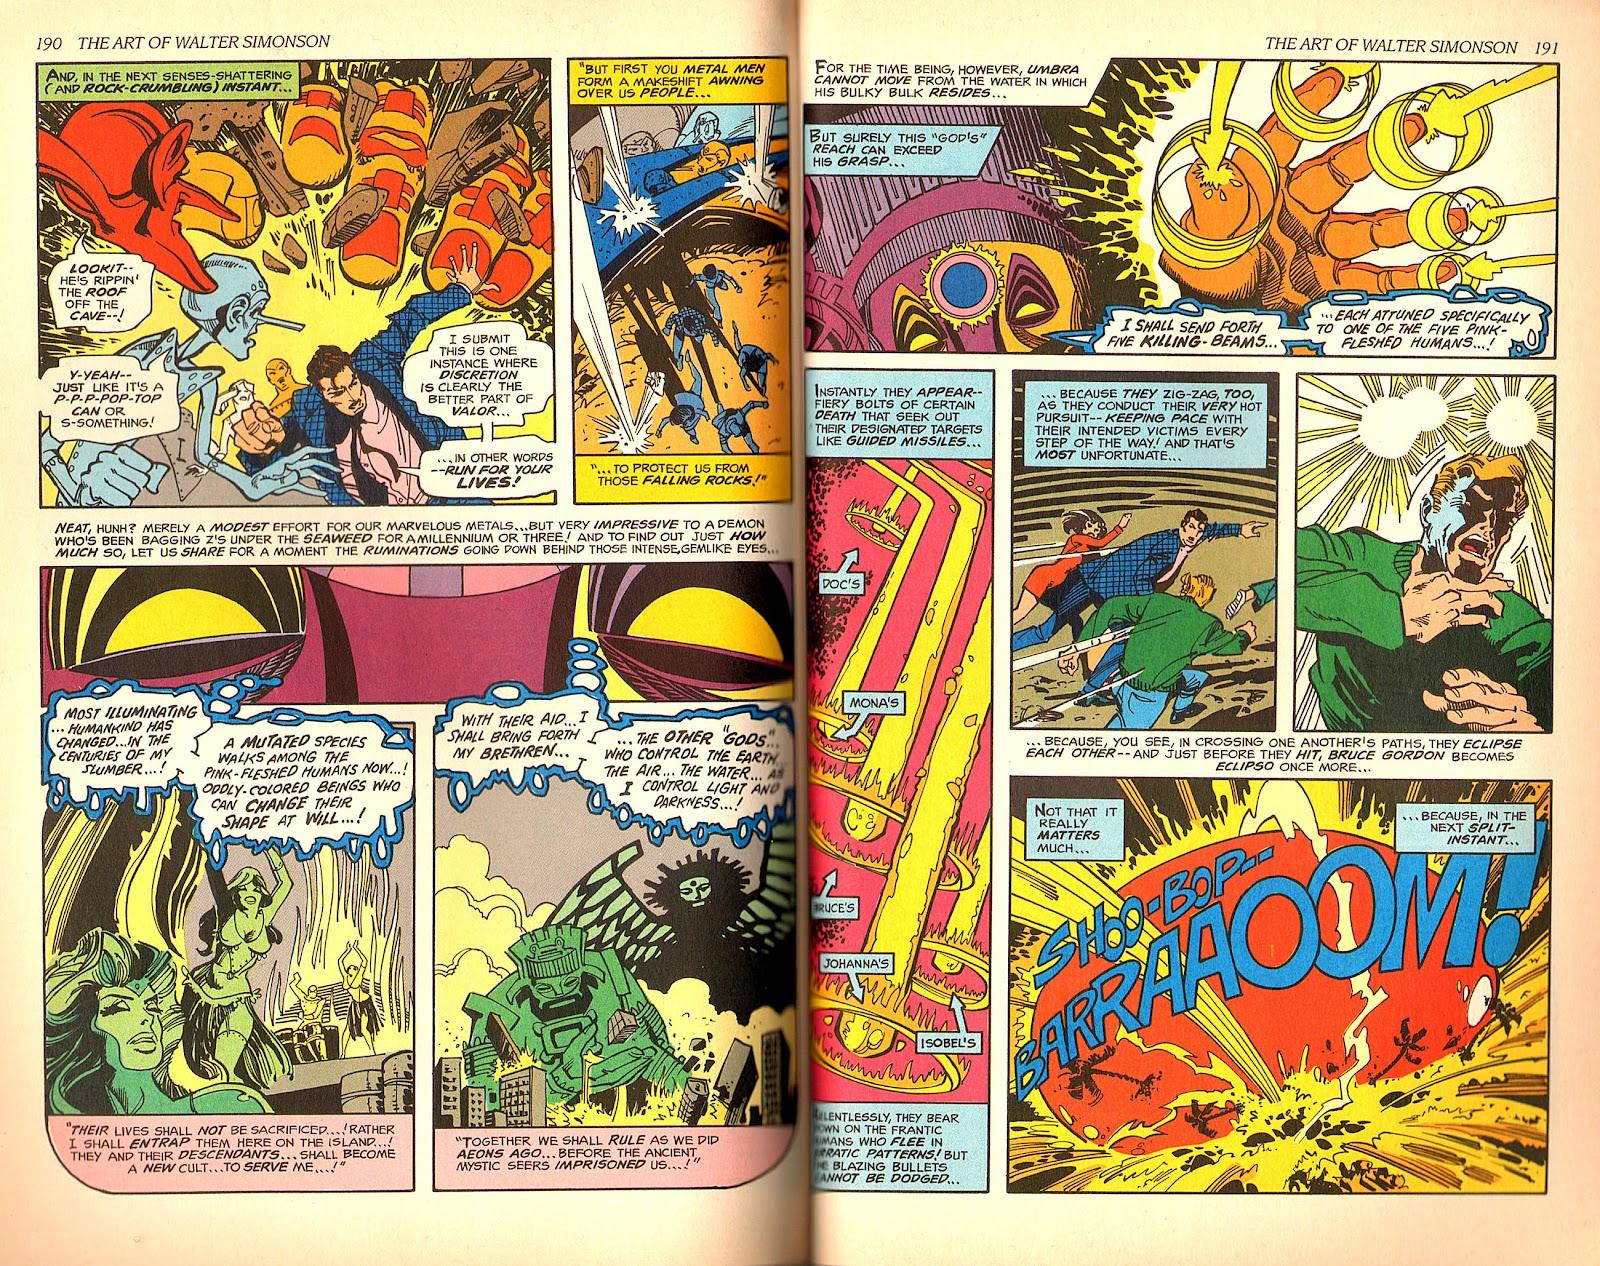 Read online The Art of Walter Simonson comic -  Issue # TPB - 97